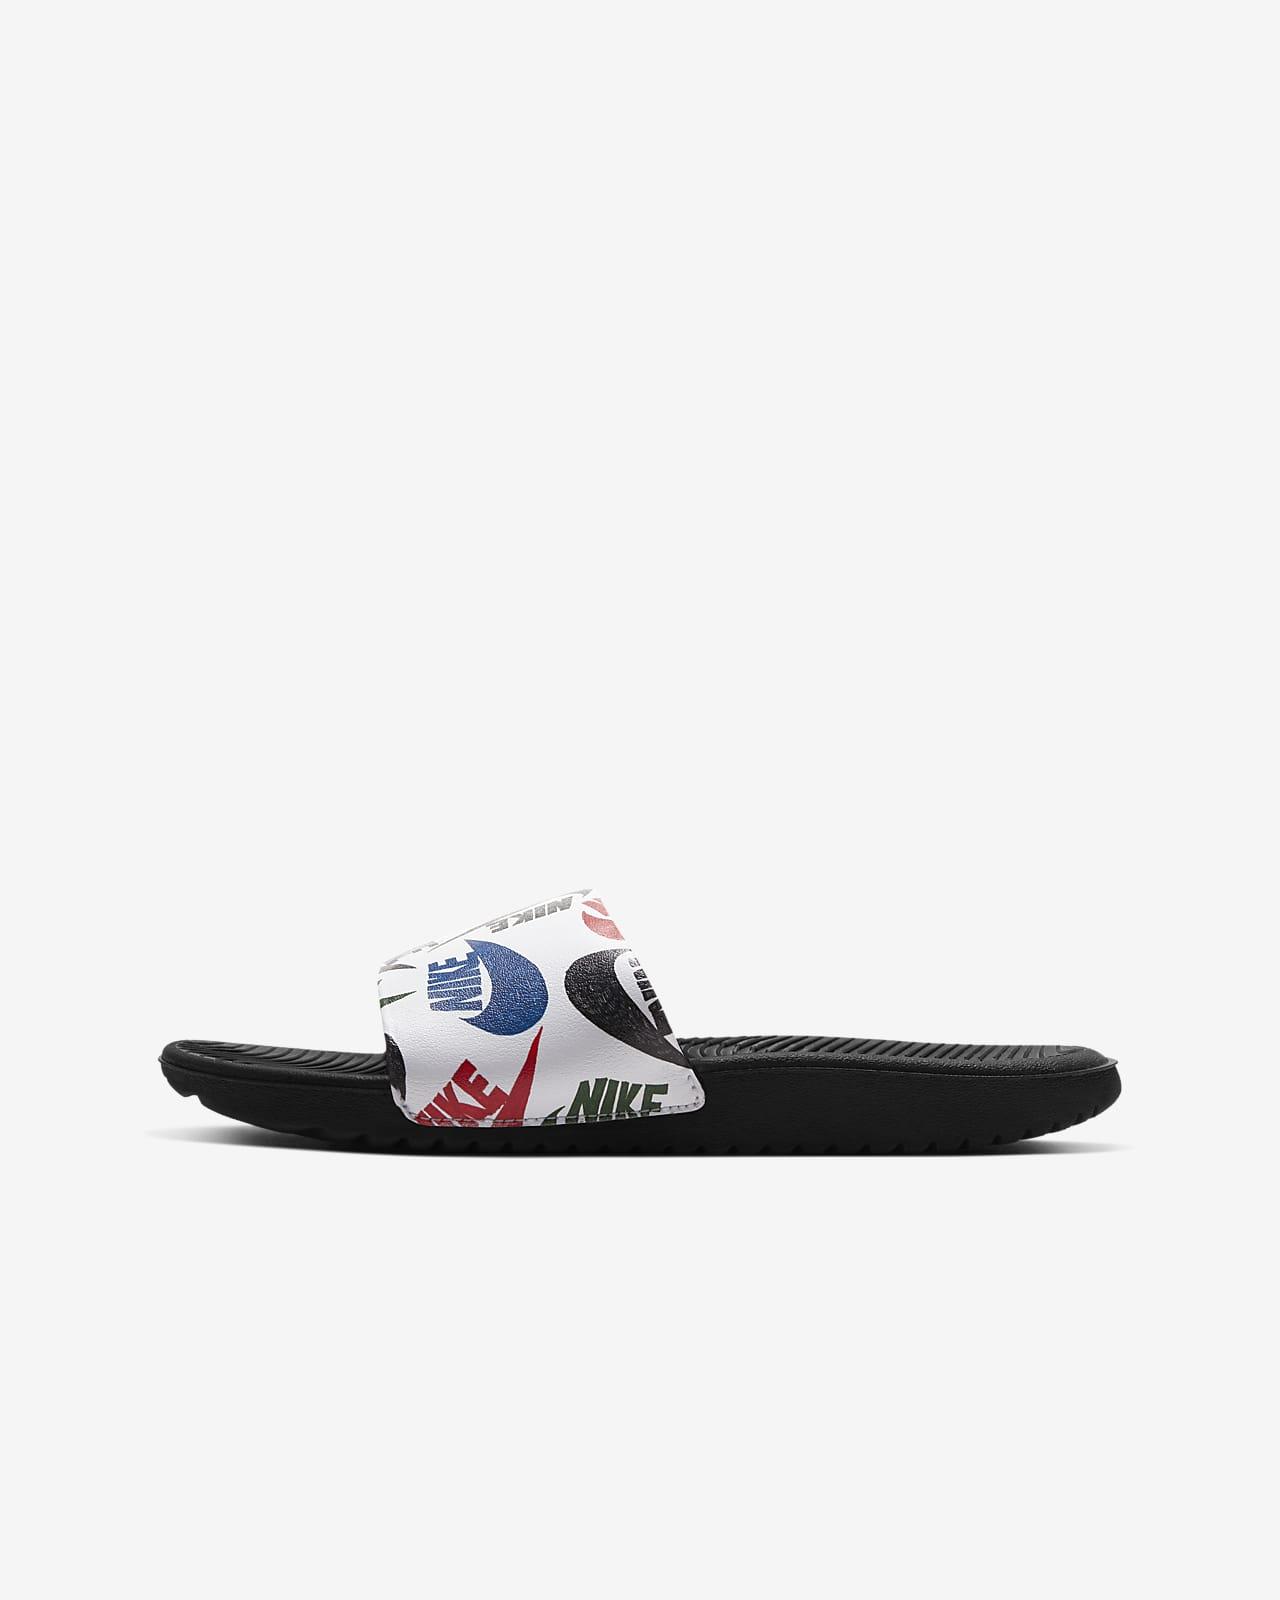 Nike Kawa SE JDI Küçük/Genç Çocuk Terliği